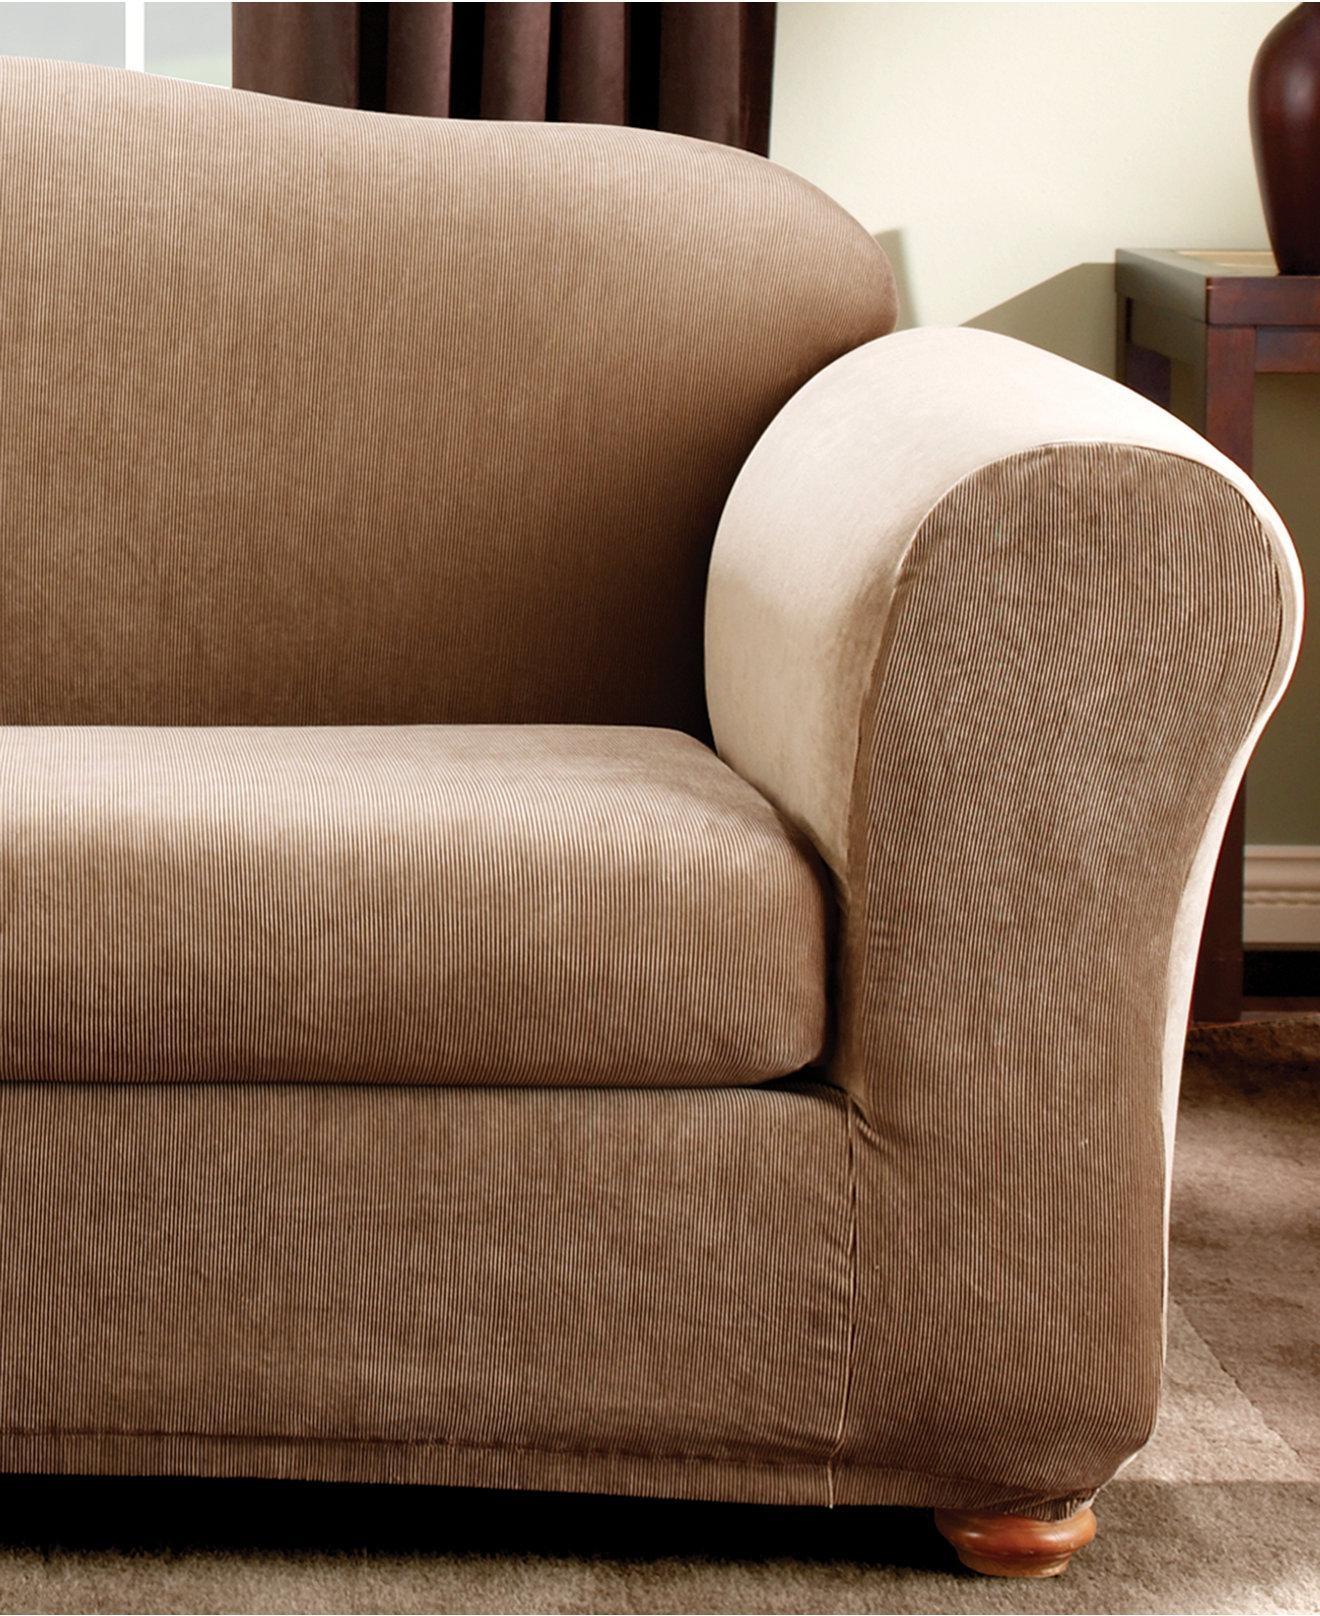 20 s 3 Piece Sofa Covers